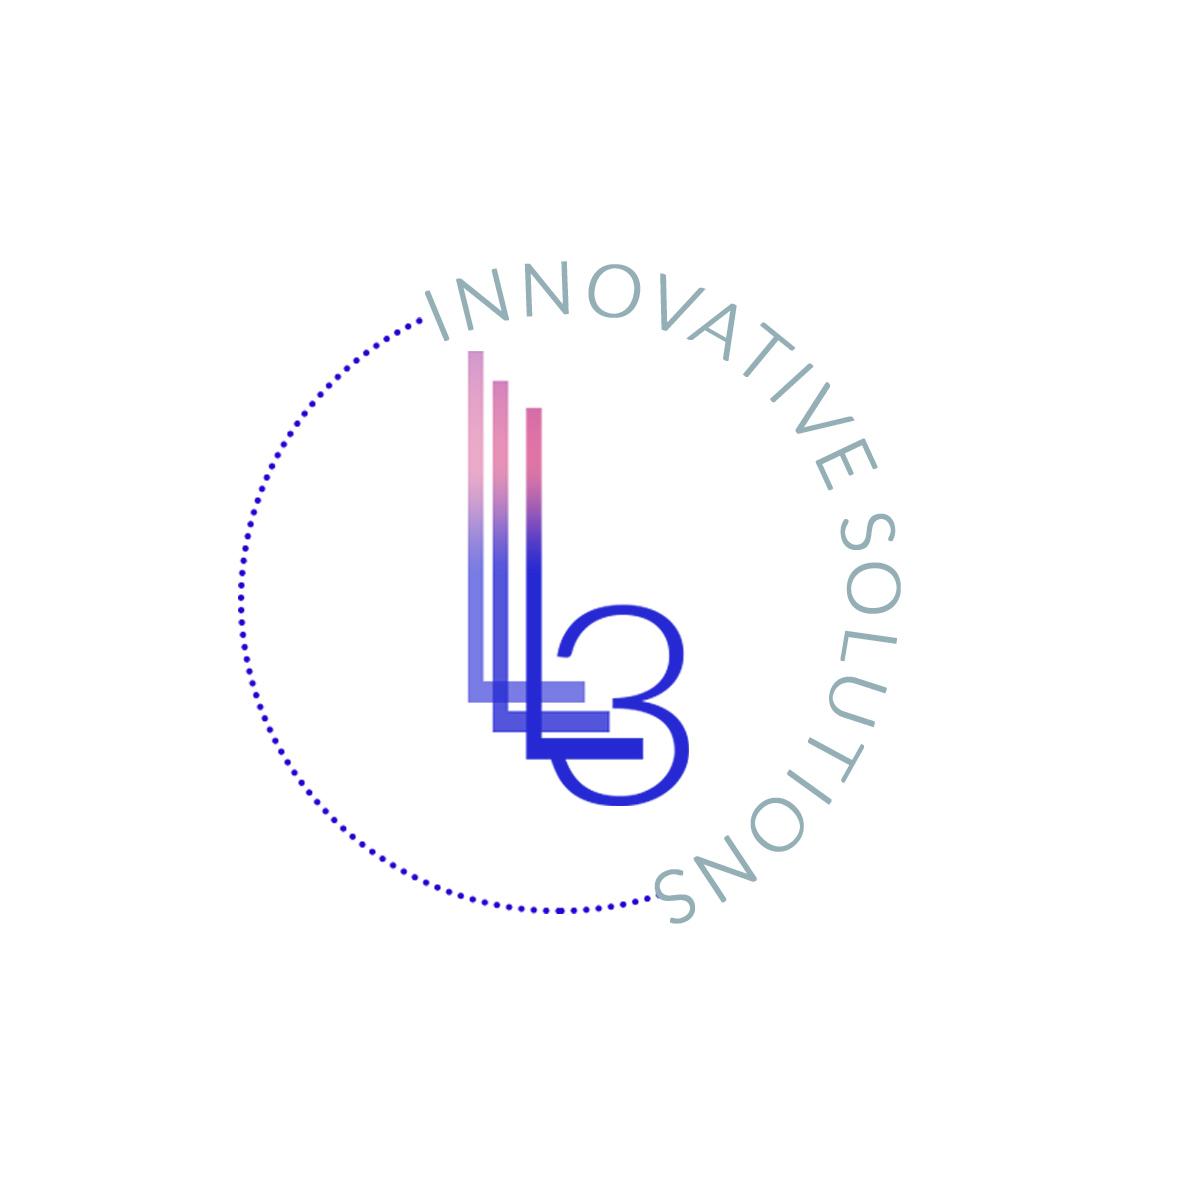 L3 Innovative Solutions